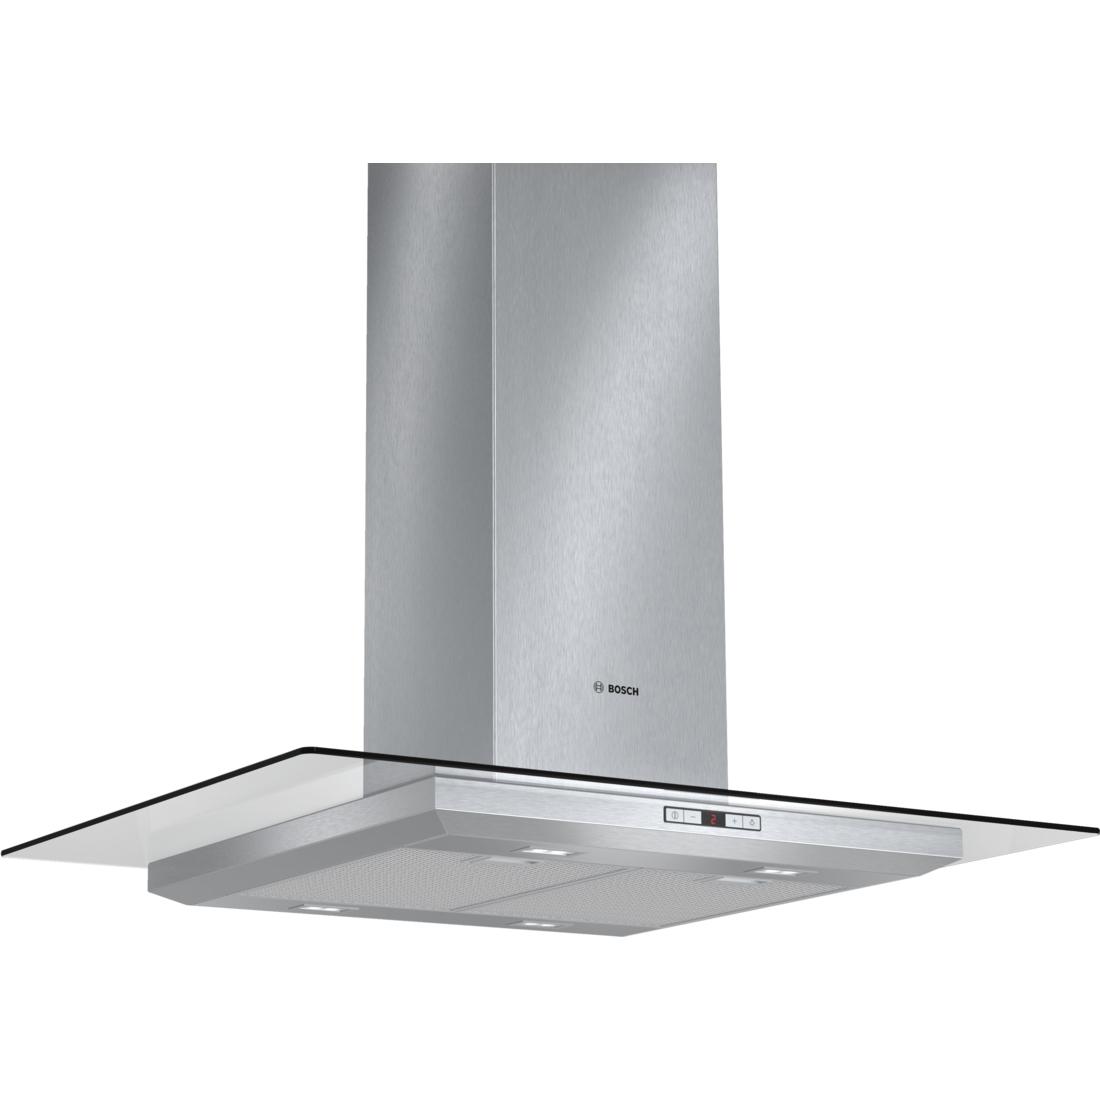 Chimney Hoods | Built in Appliances | hotpoint.co.ke